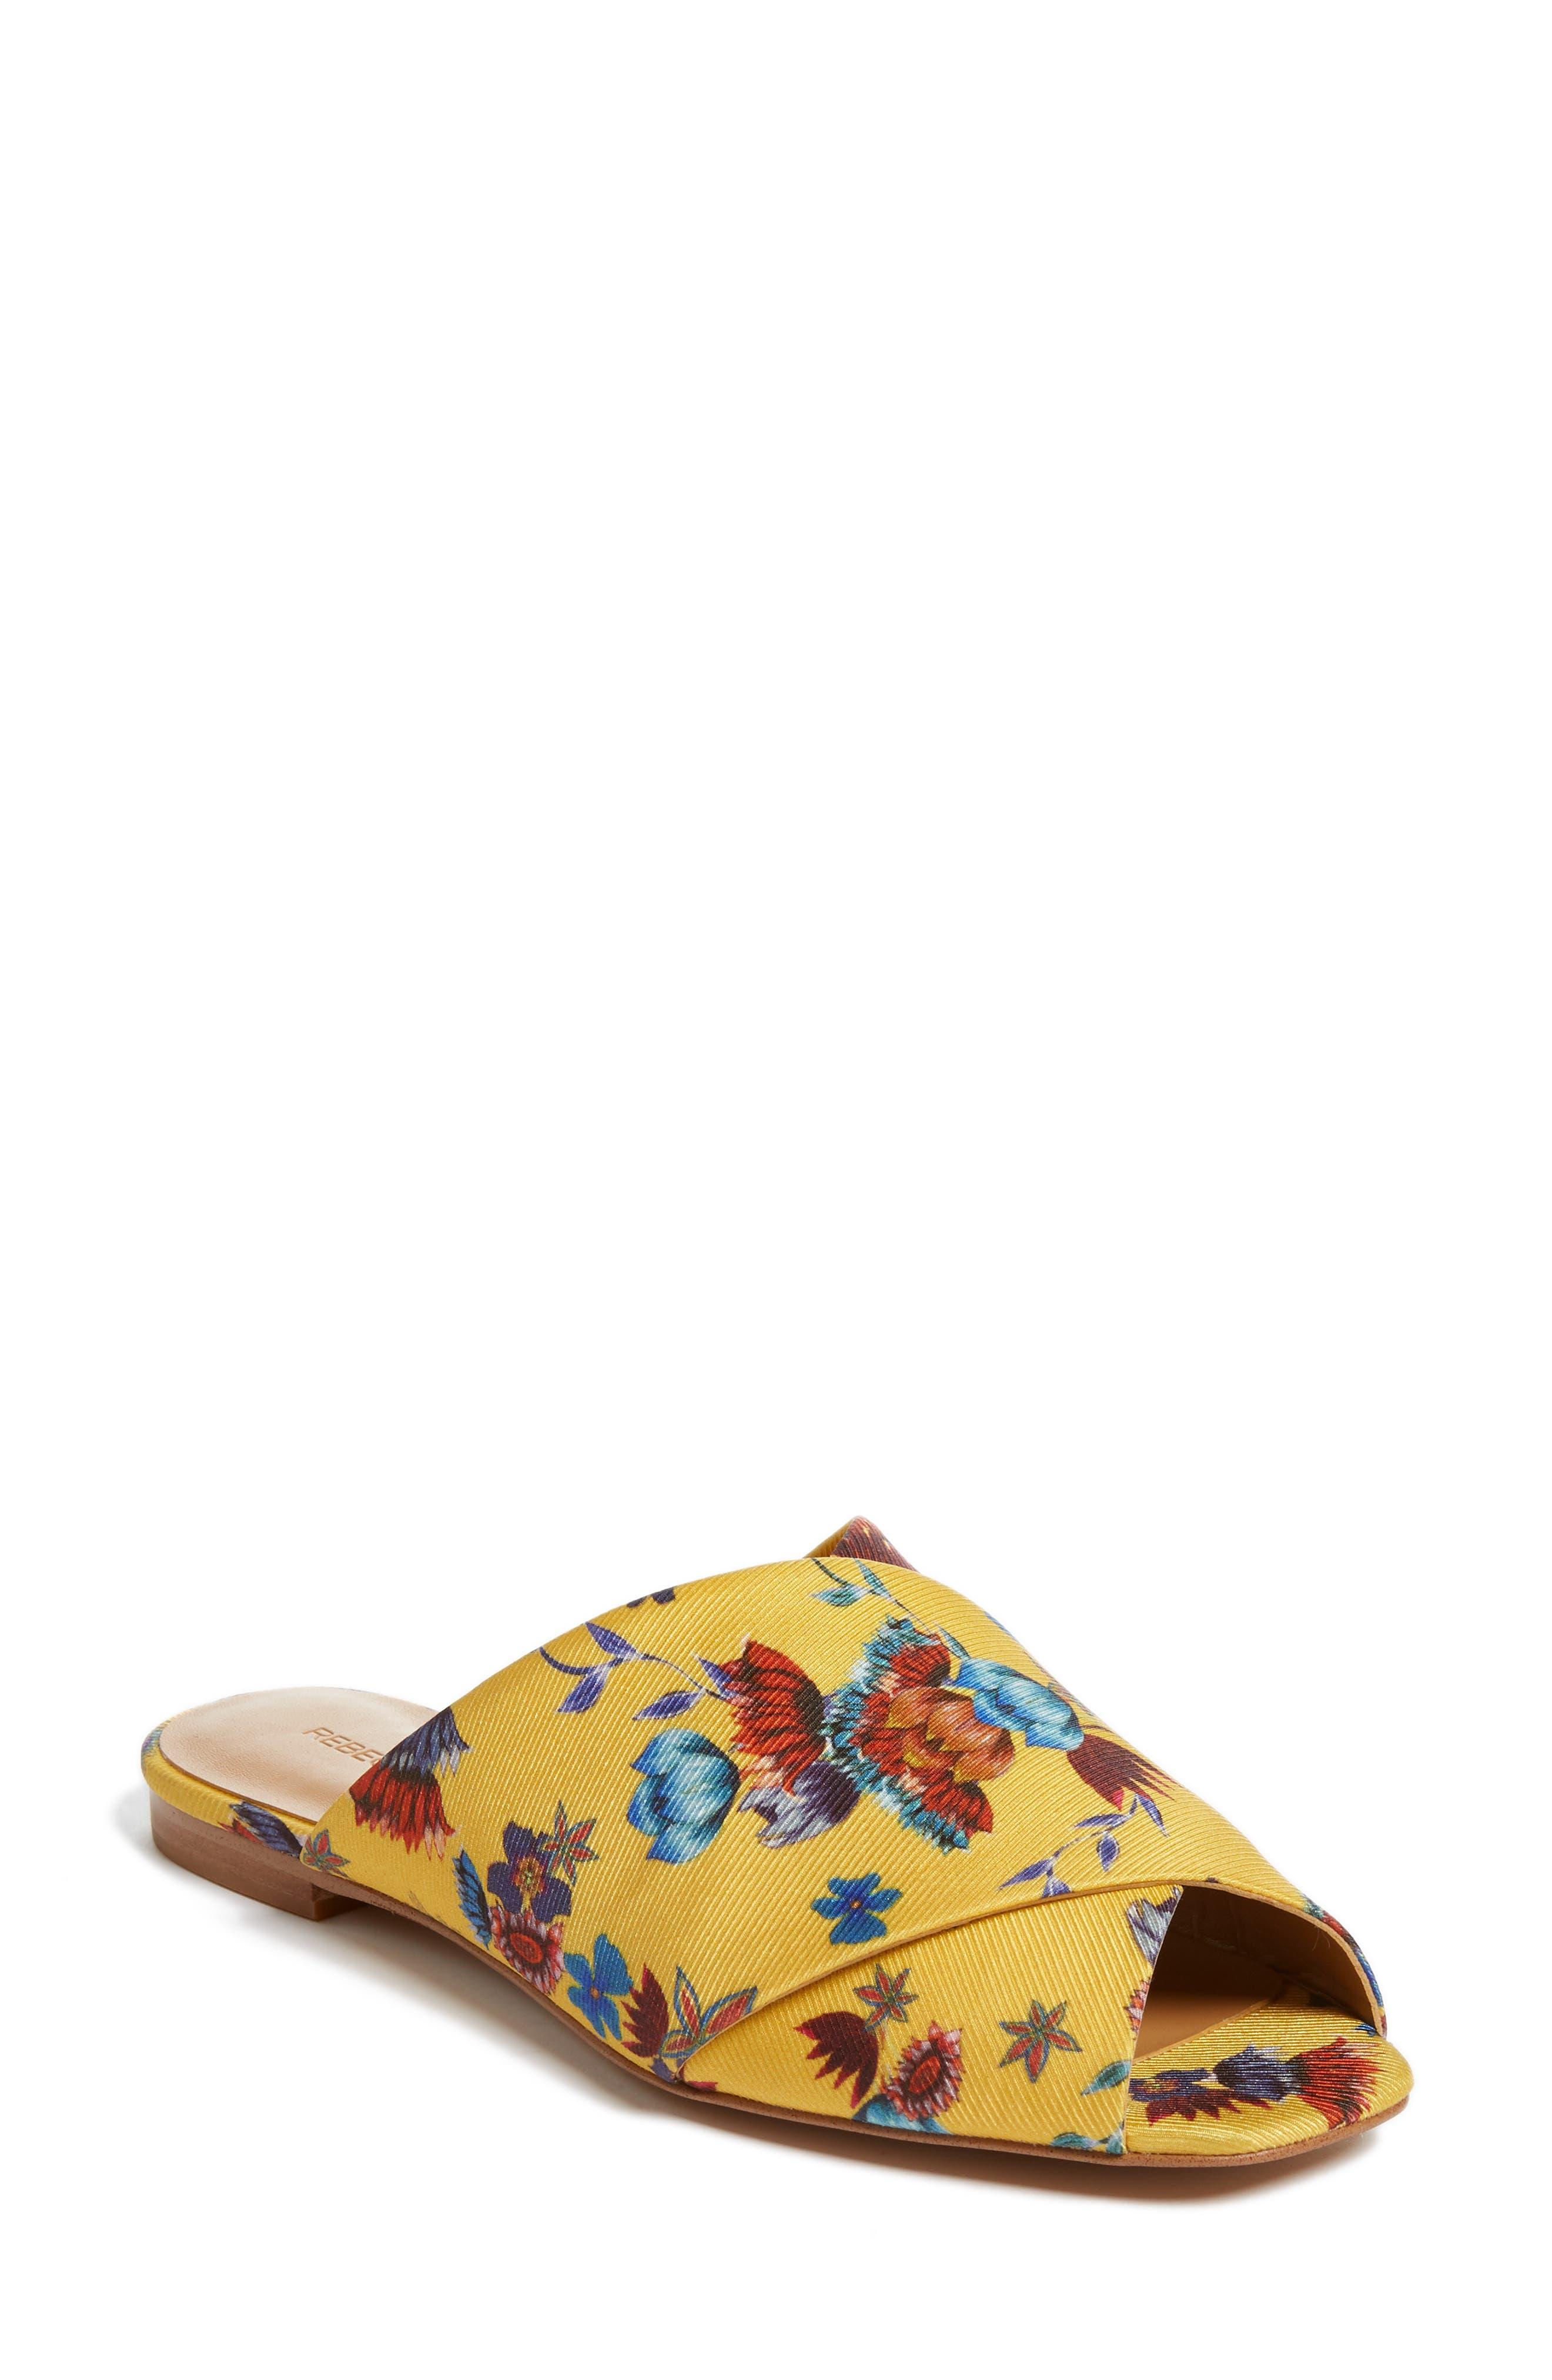 Anden Slide Sandal,                         Main,                         color, Butterscotch Multi Print Silk